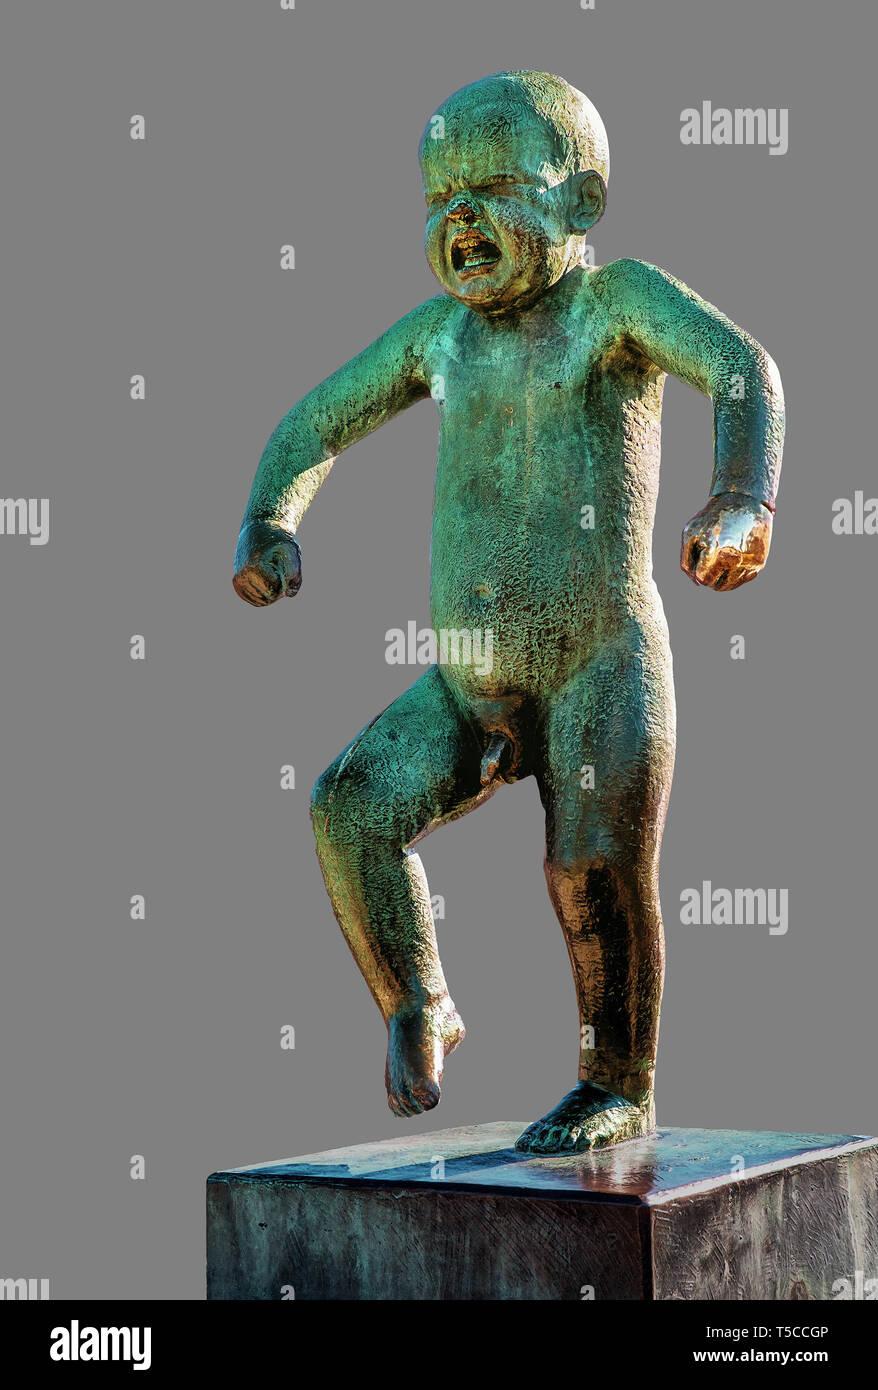 The sculptures of Gustav Vigeland: Angry Boy (Sinnataggen) - Stock Image